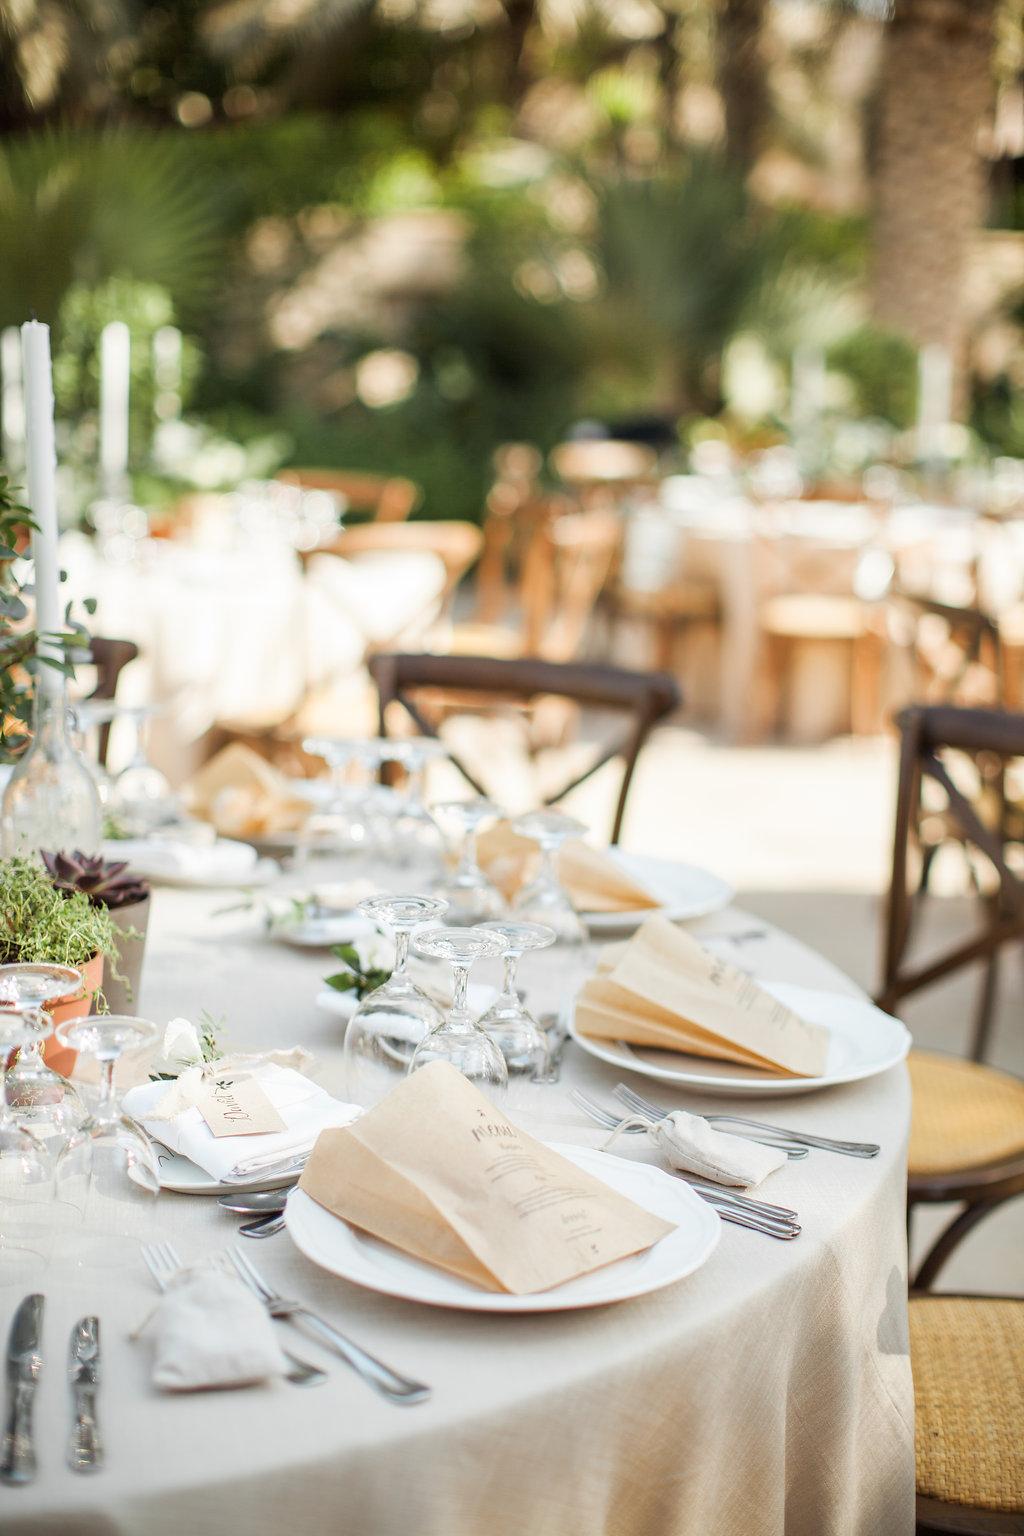 Maria_Sundin_Photography_Wedding_Dubai_Magnolia_Al_Qasr_Gemma_Ryan-336